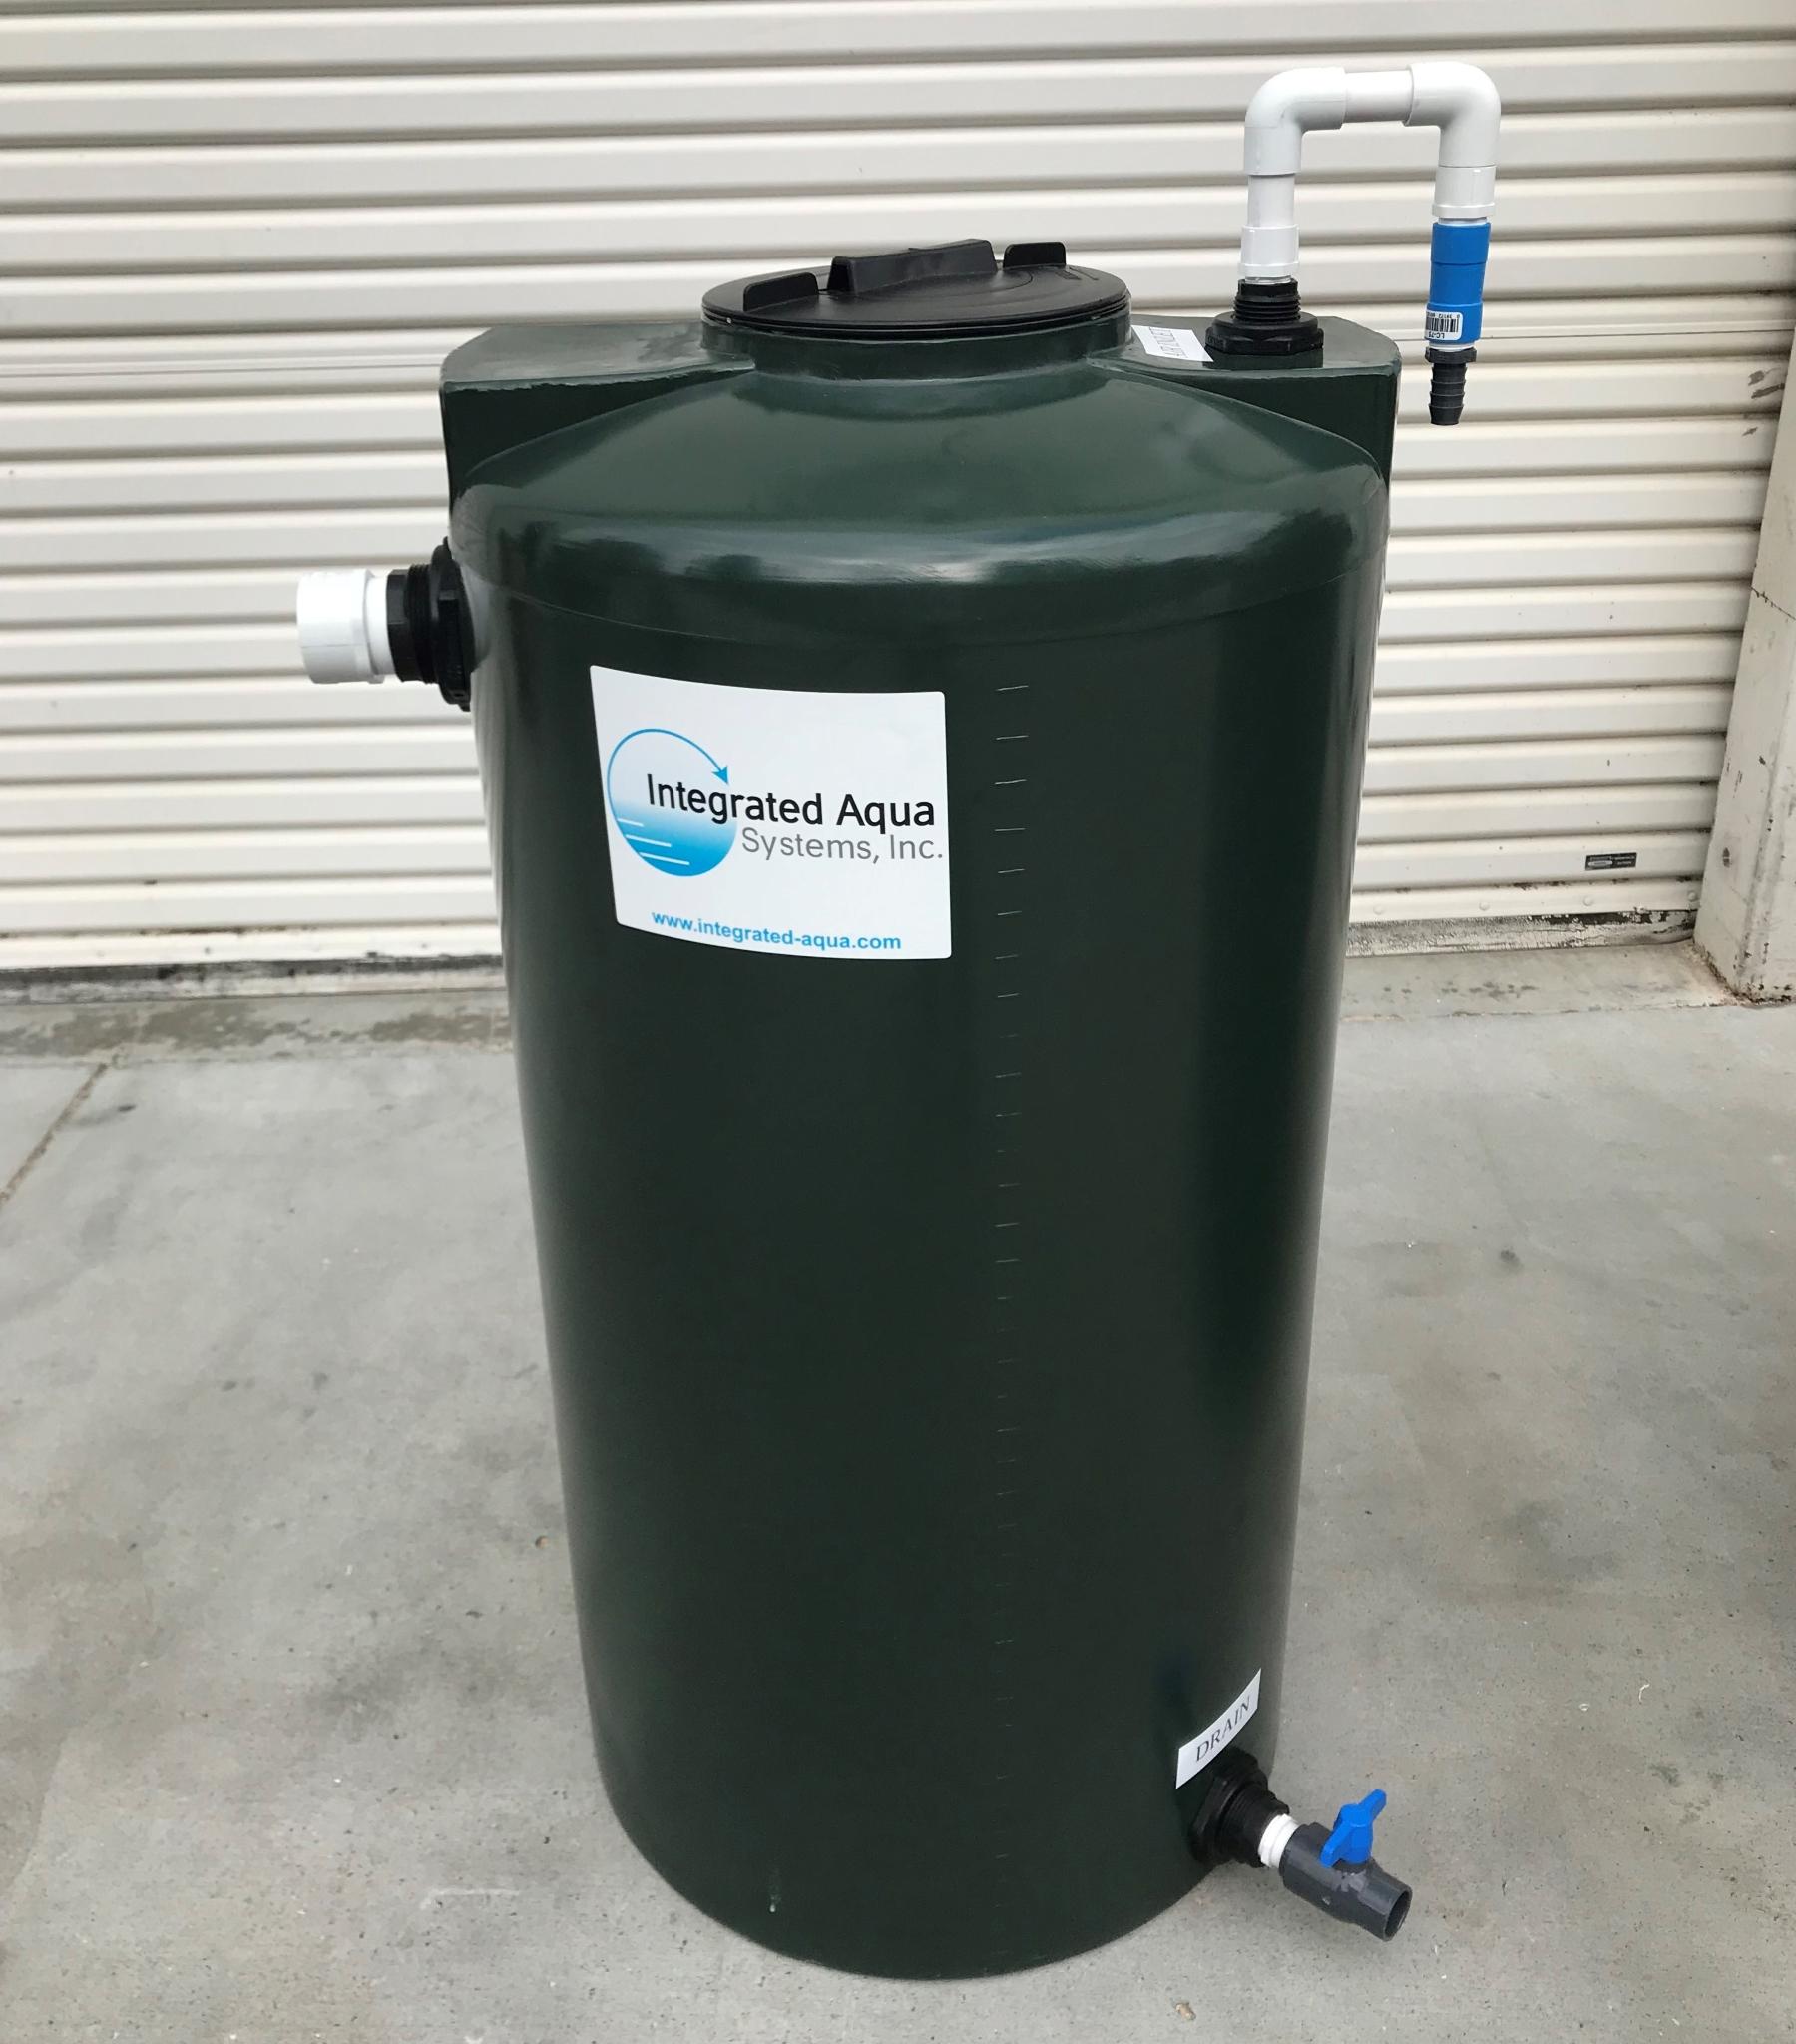 Integrated Aqua Systems BioElement Biofilter